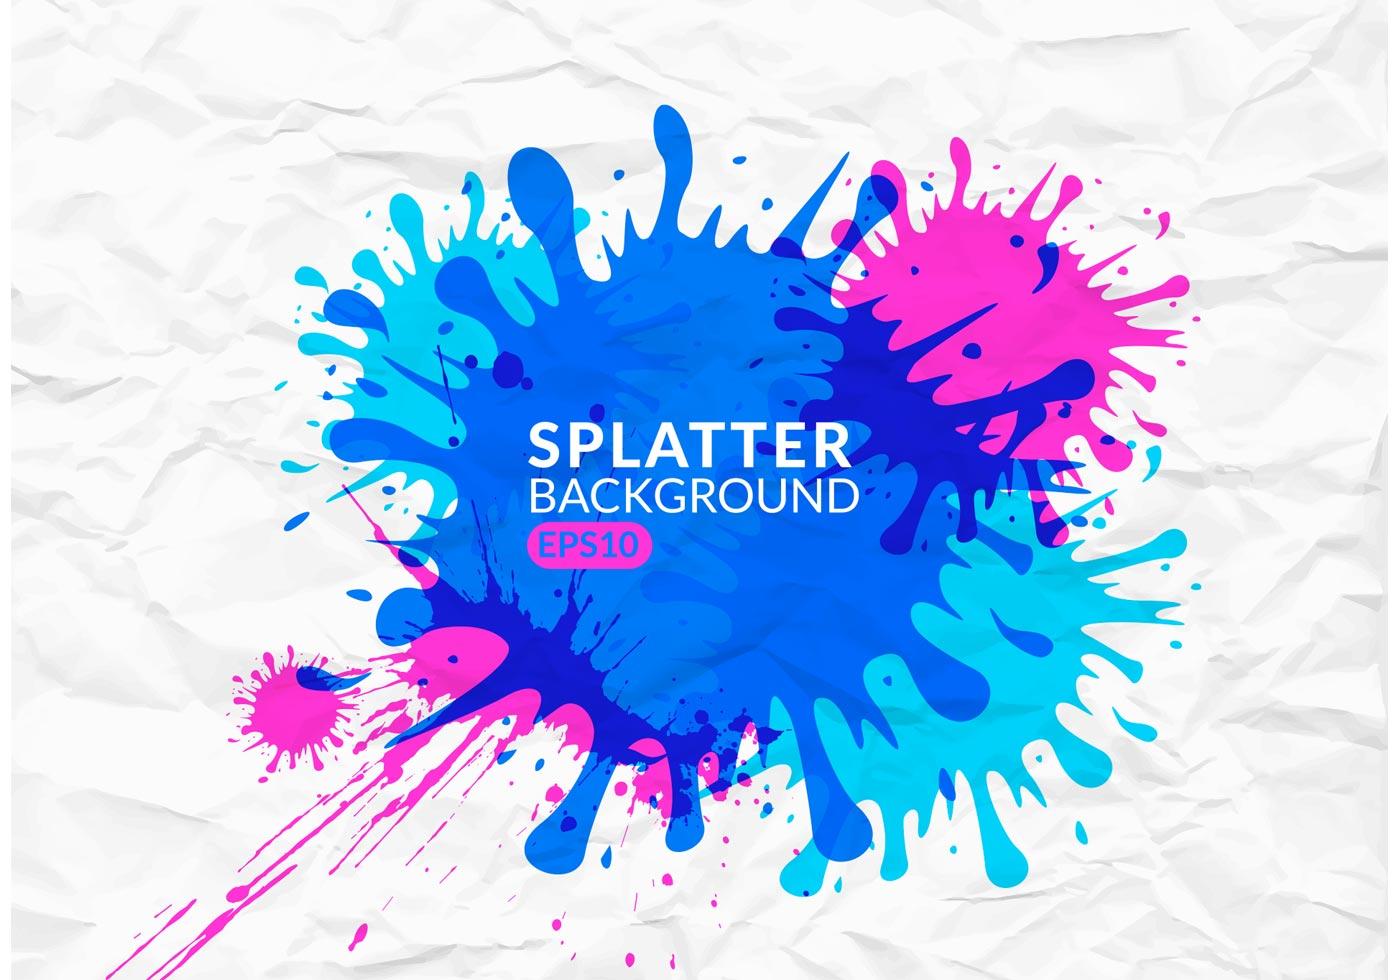 Splatter Background Vector Art & Graphics | freevector.com